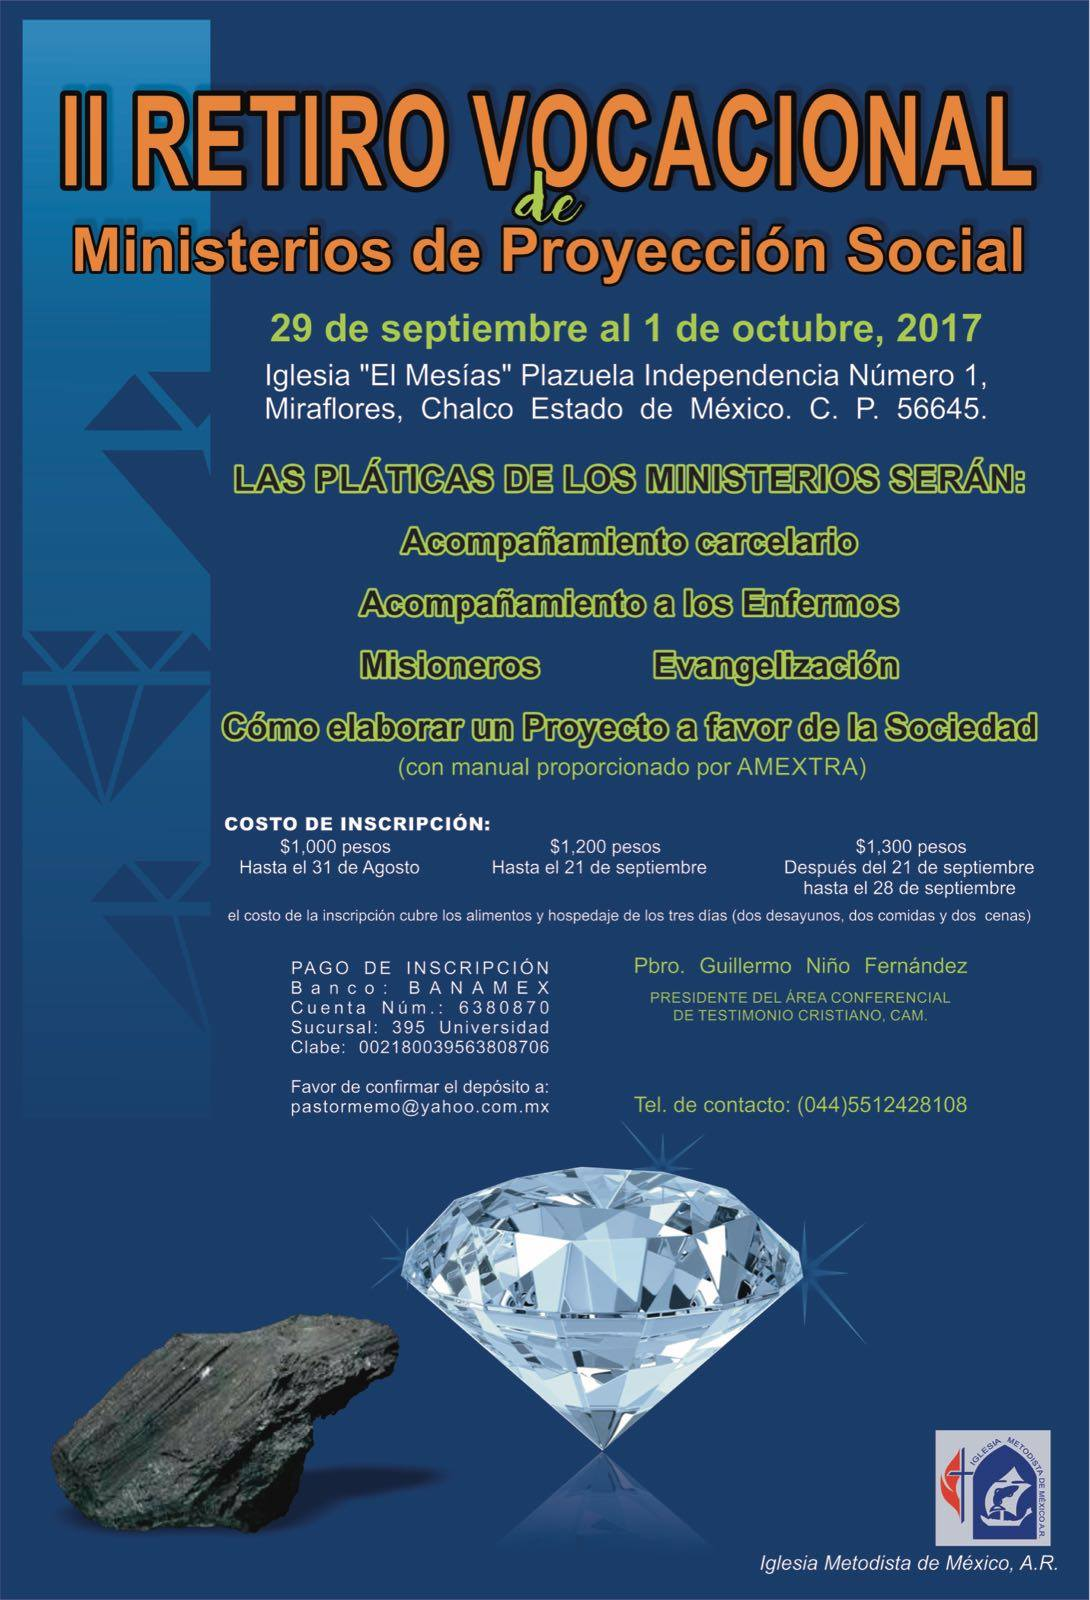 Ministerios de Proyecci__n Social, CAM